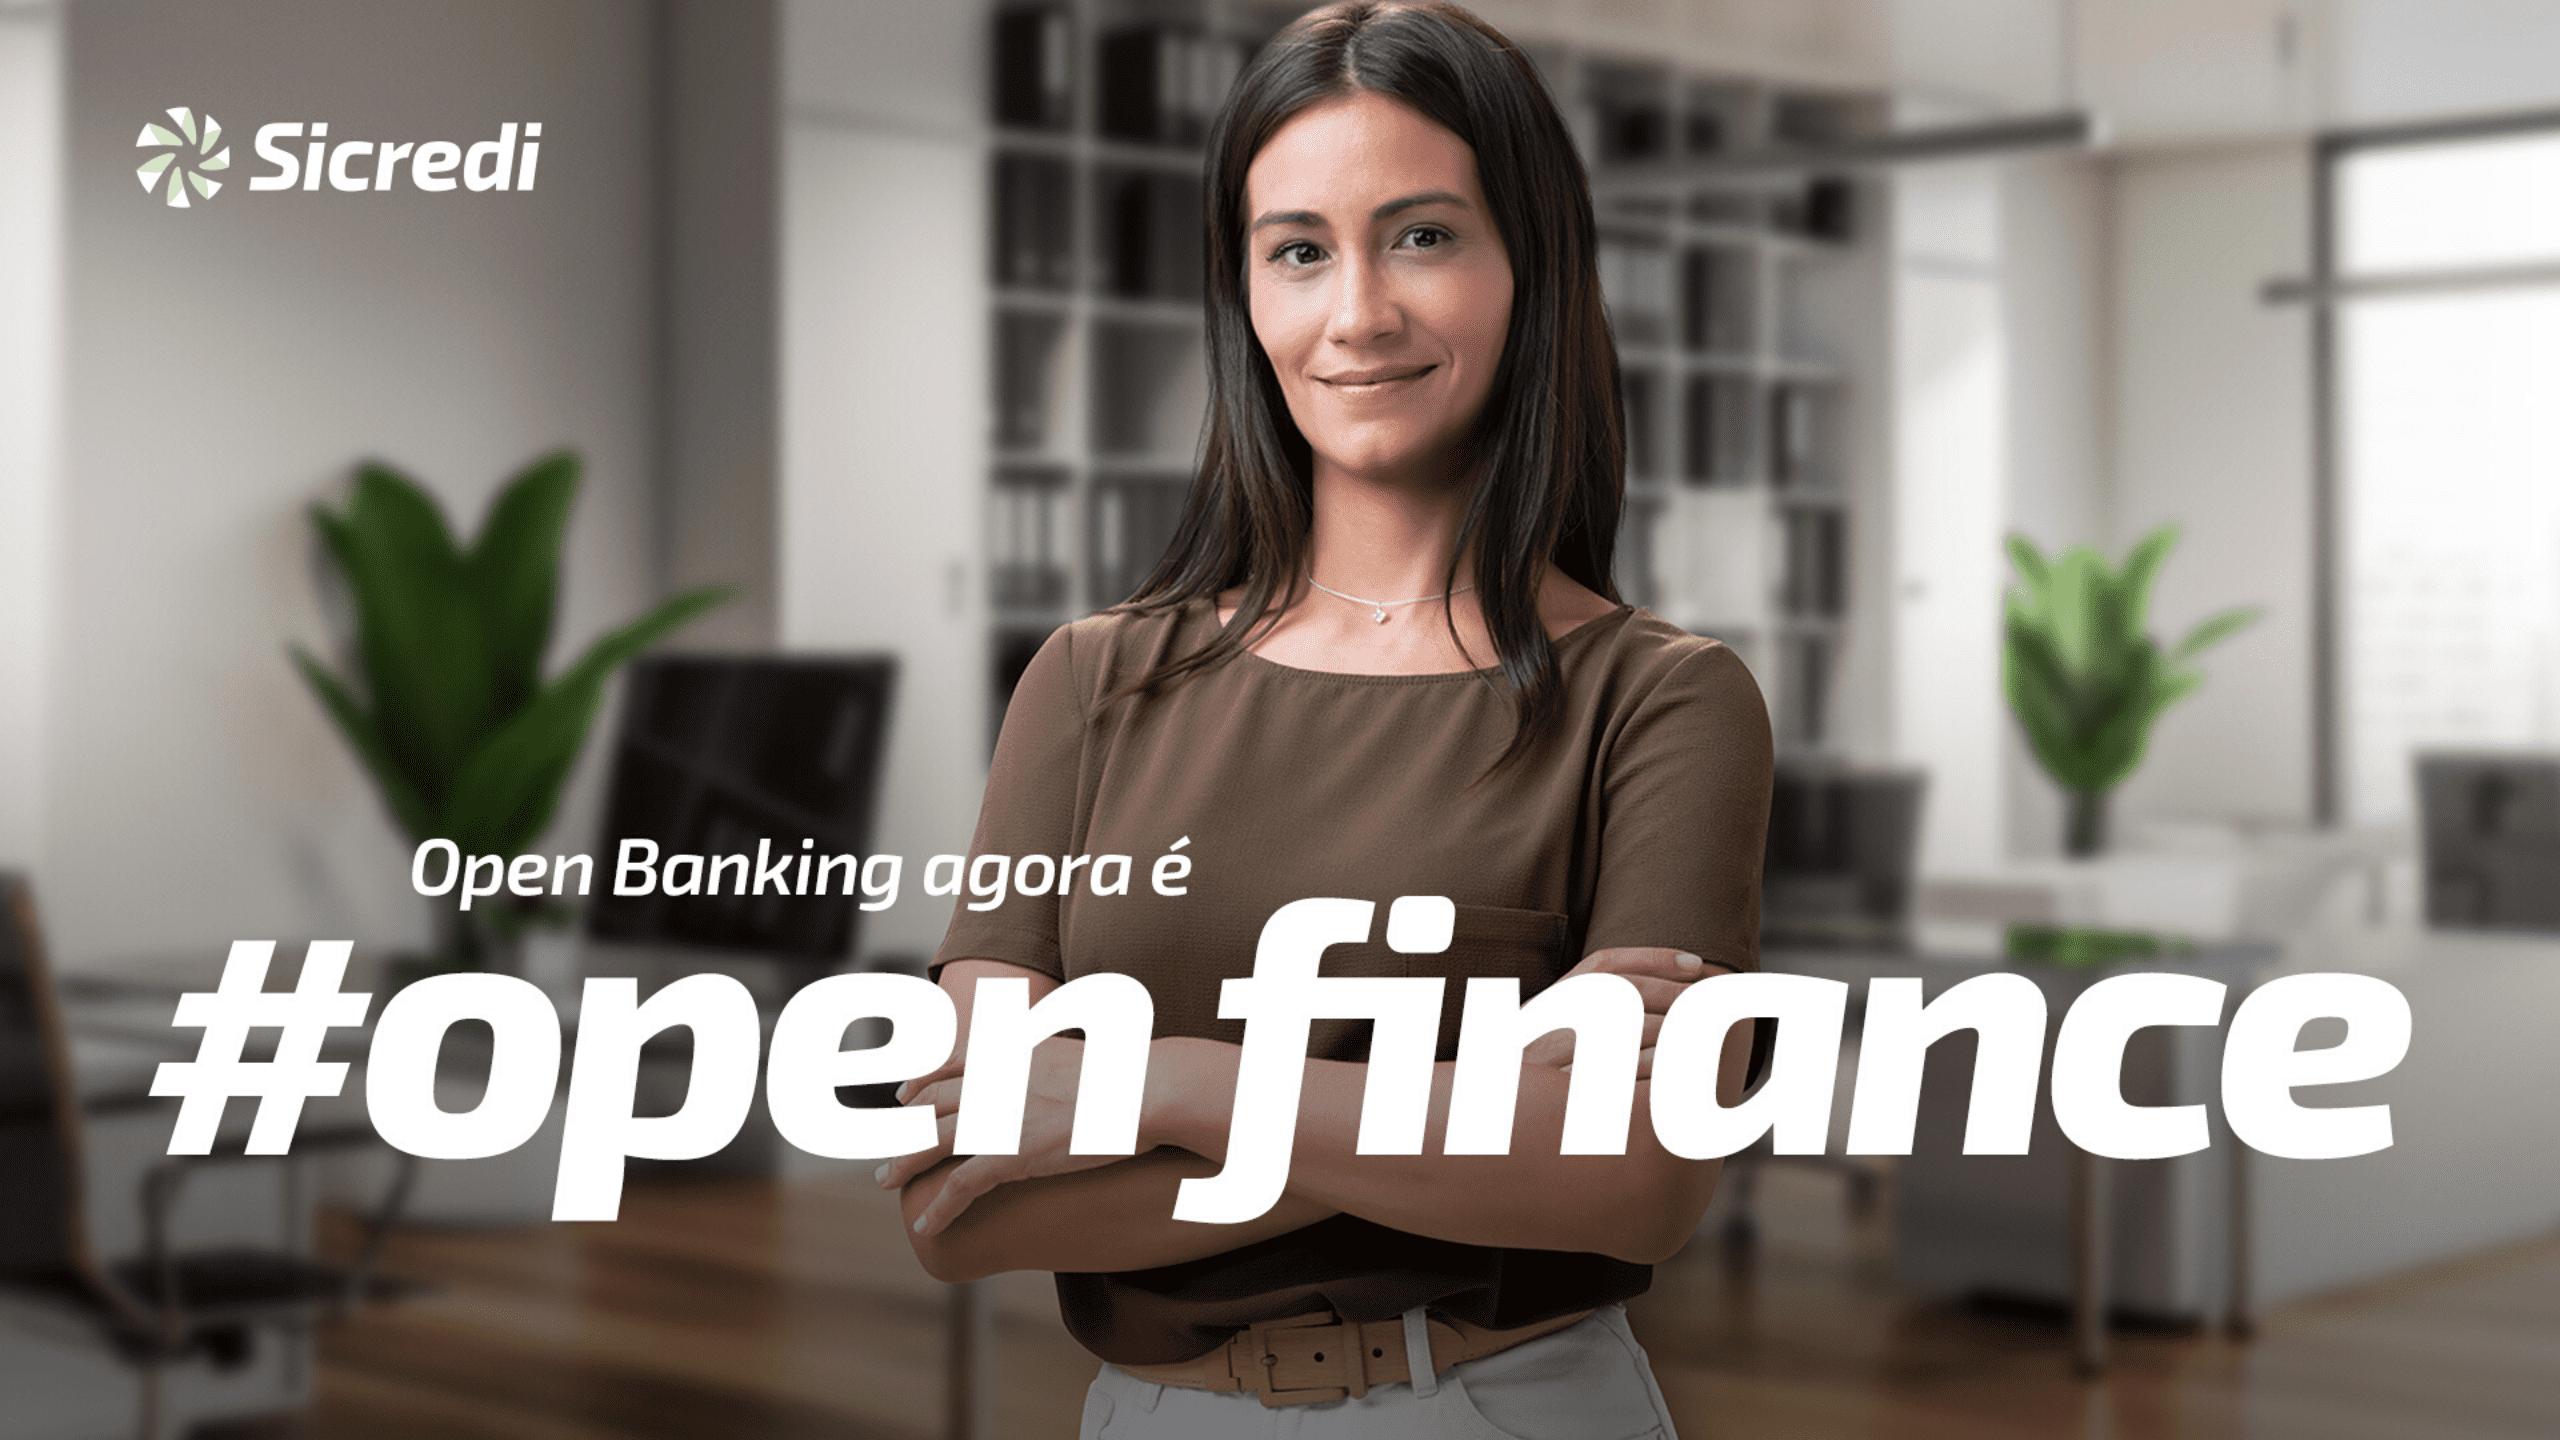 Sicredi Serrana divulga material explicativo sobre Open Banking e Open Finance